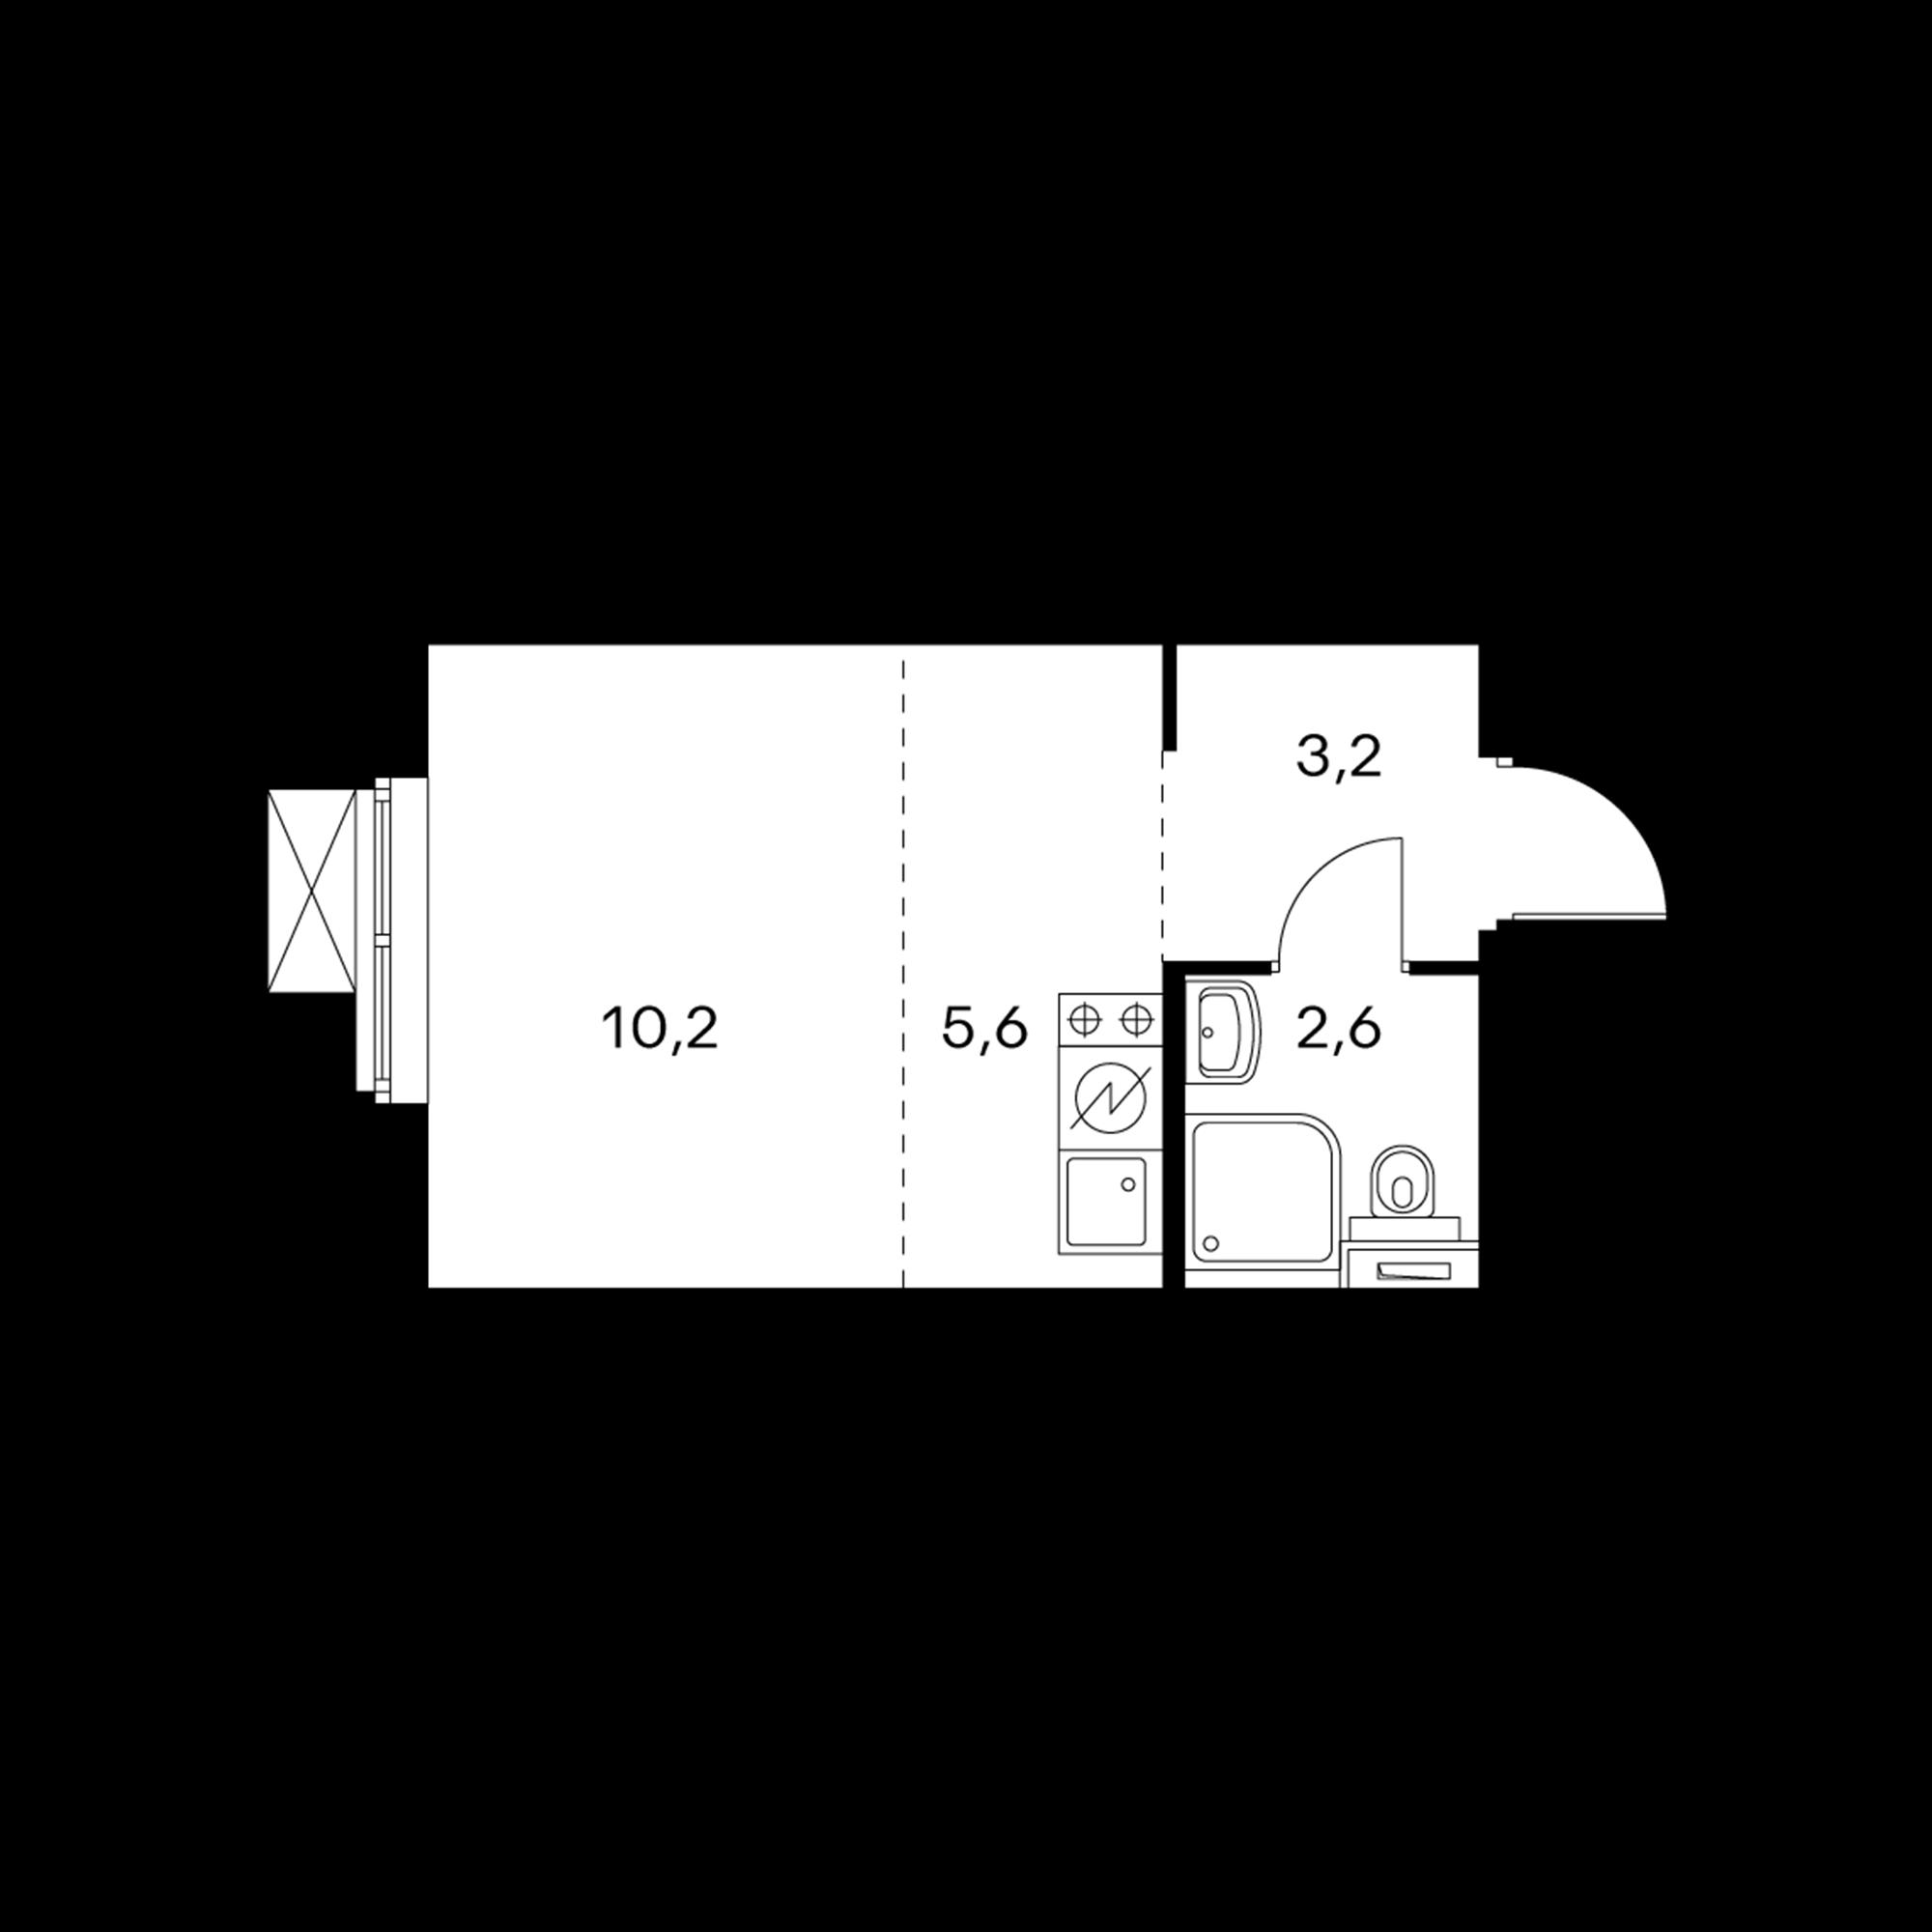 1NS1_3.9-1